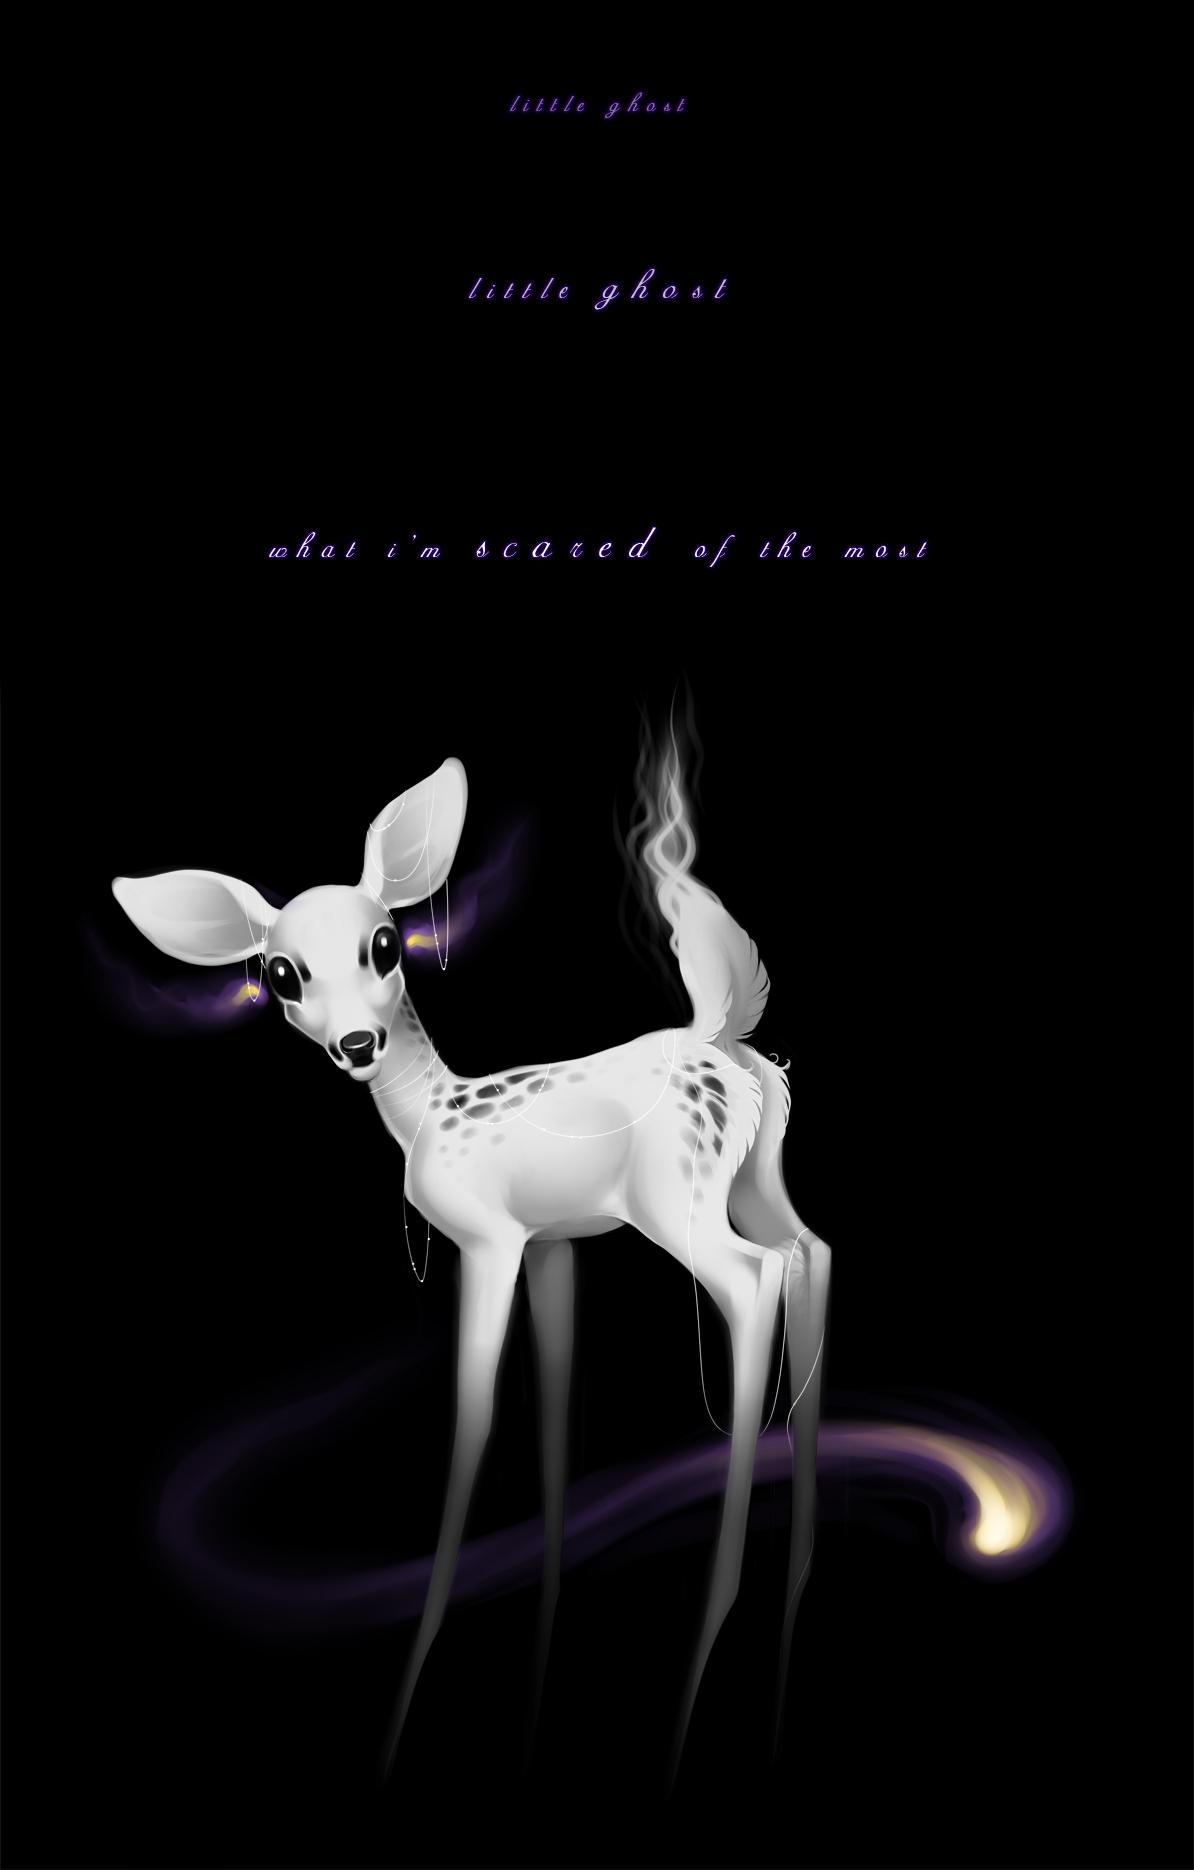 Little Ghost by Shadowwolf